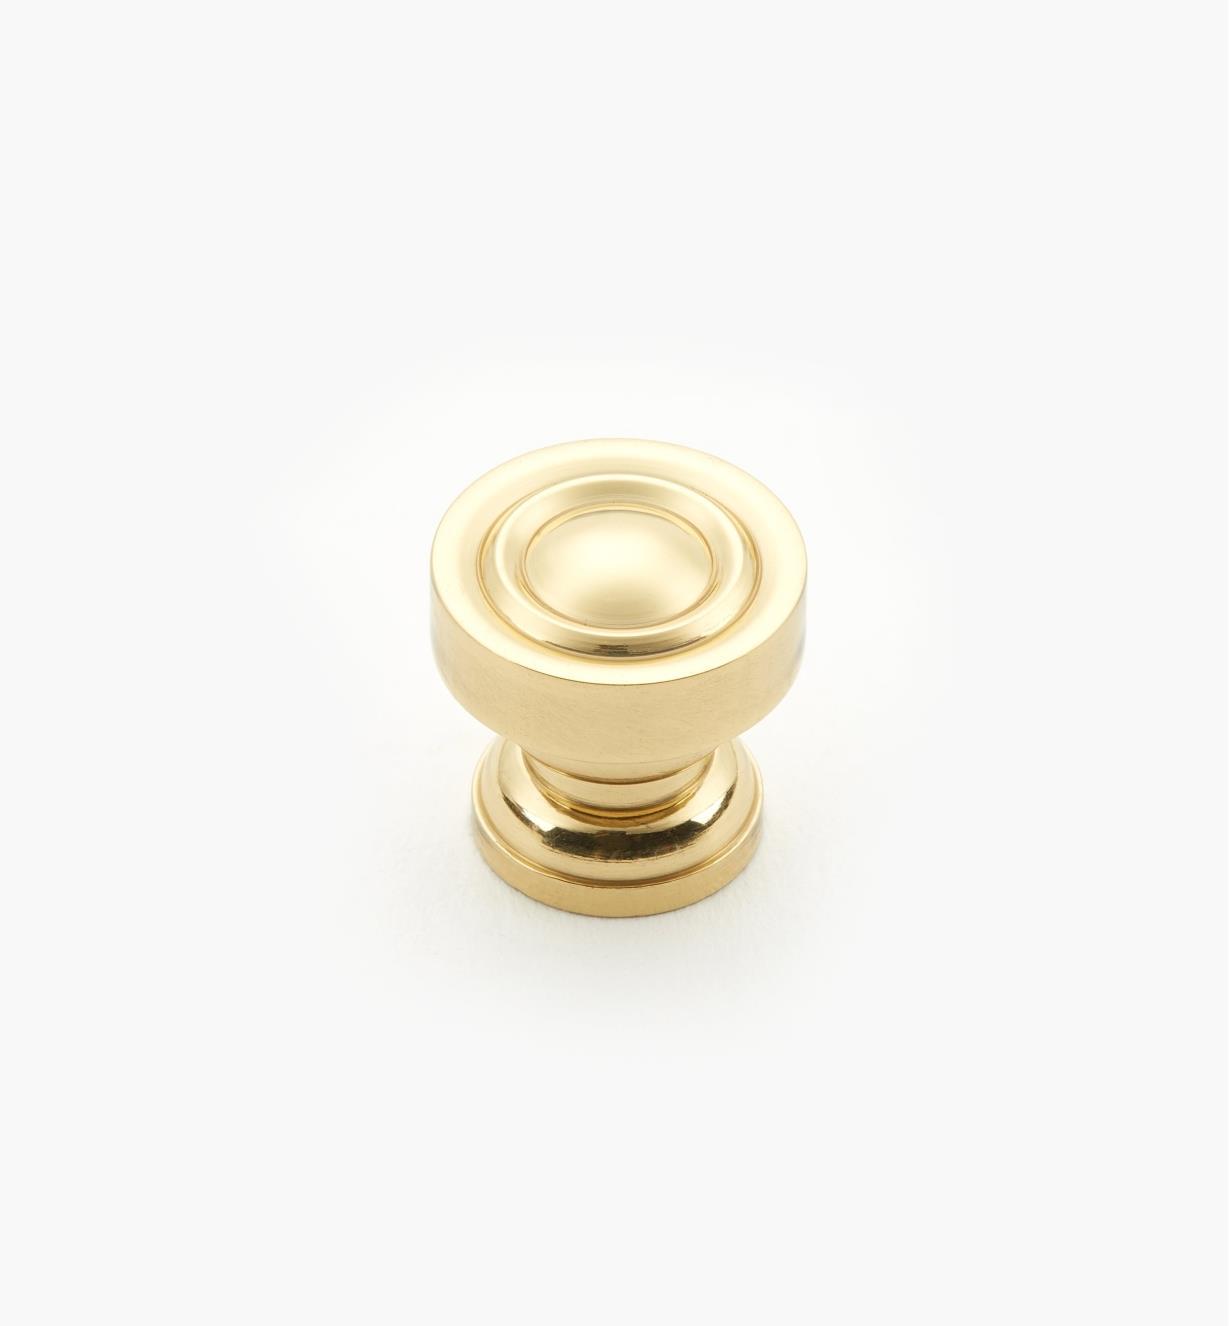 01W1311 - Petit bouton en laiton, fini poli, 9/16pox9/16po